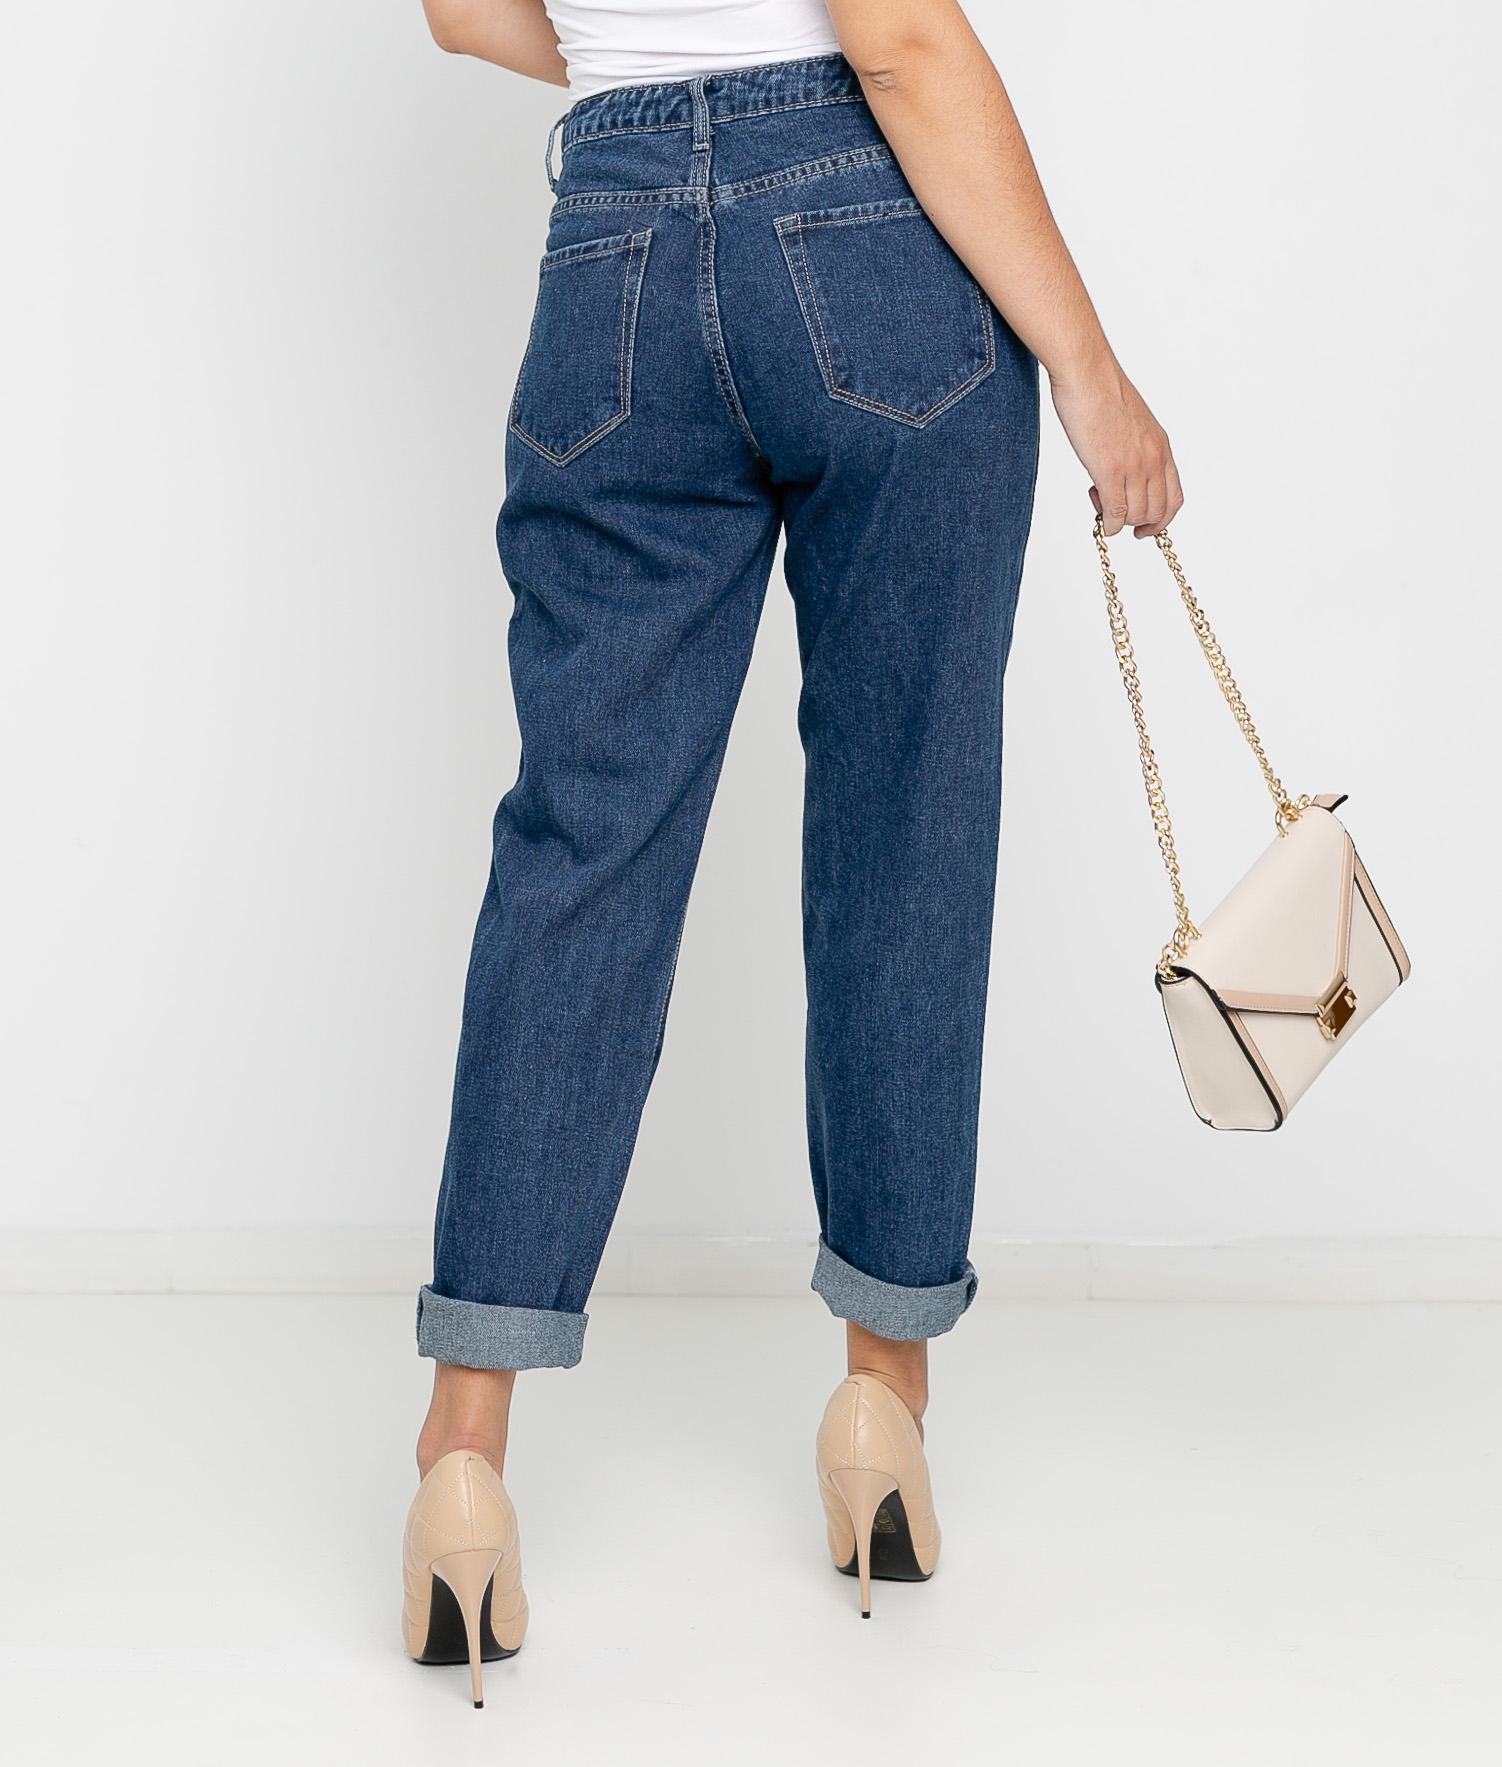 Pantaloni Goria - Denim scuro